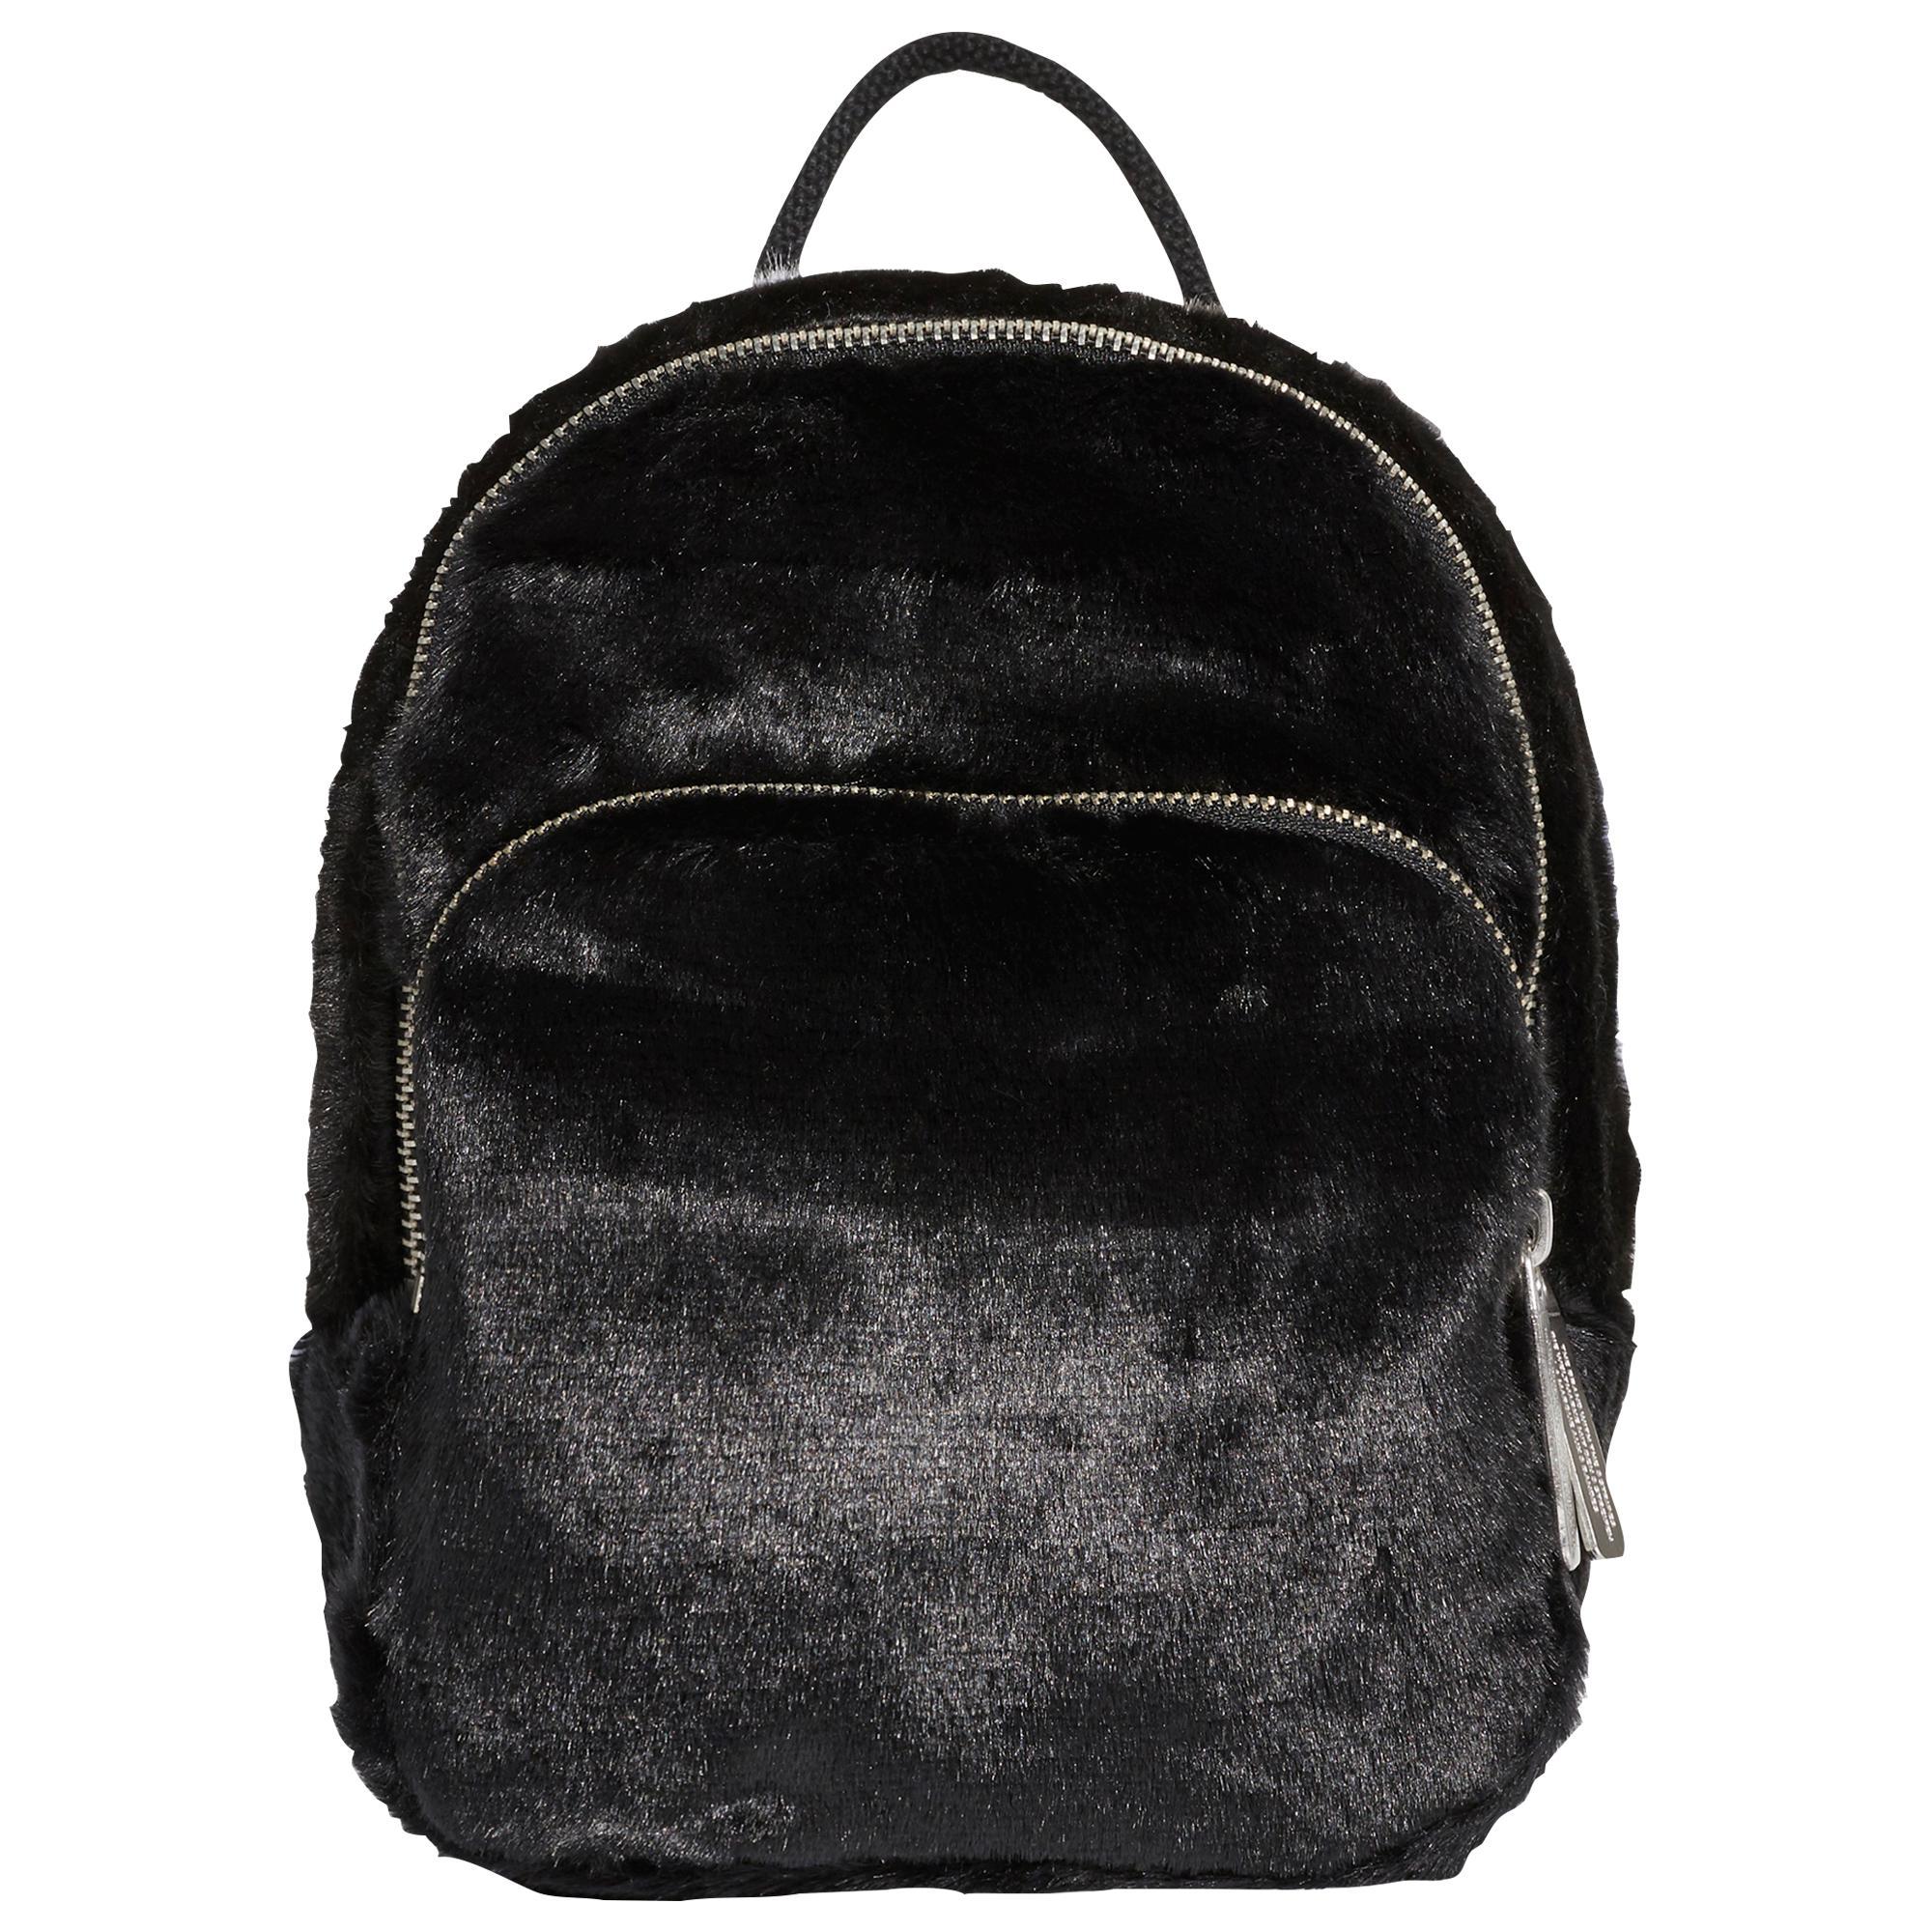 257a0b60a4 Lyst - adidas Originals Classic Mini Fur Backpack in Black